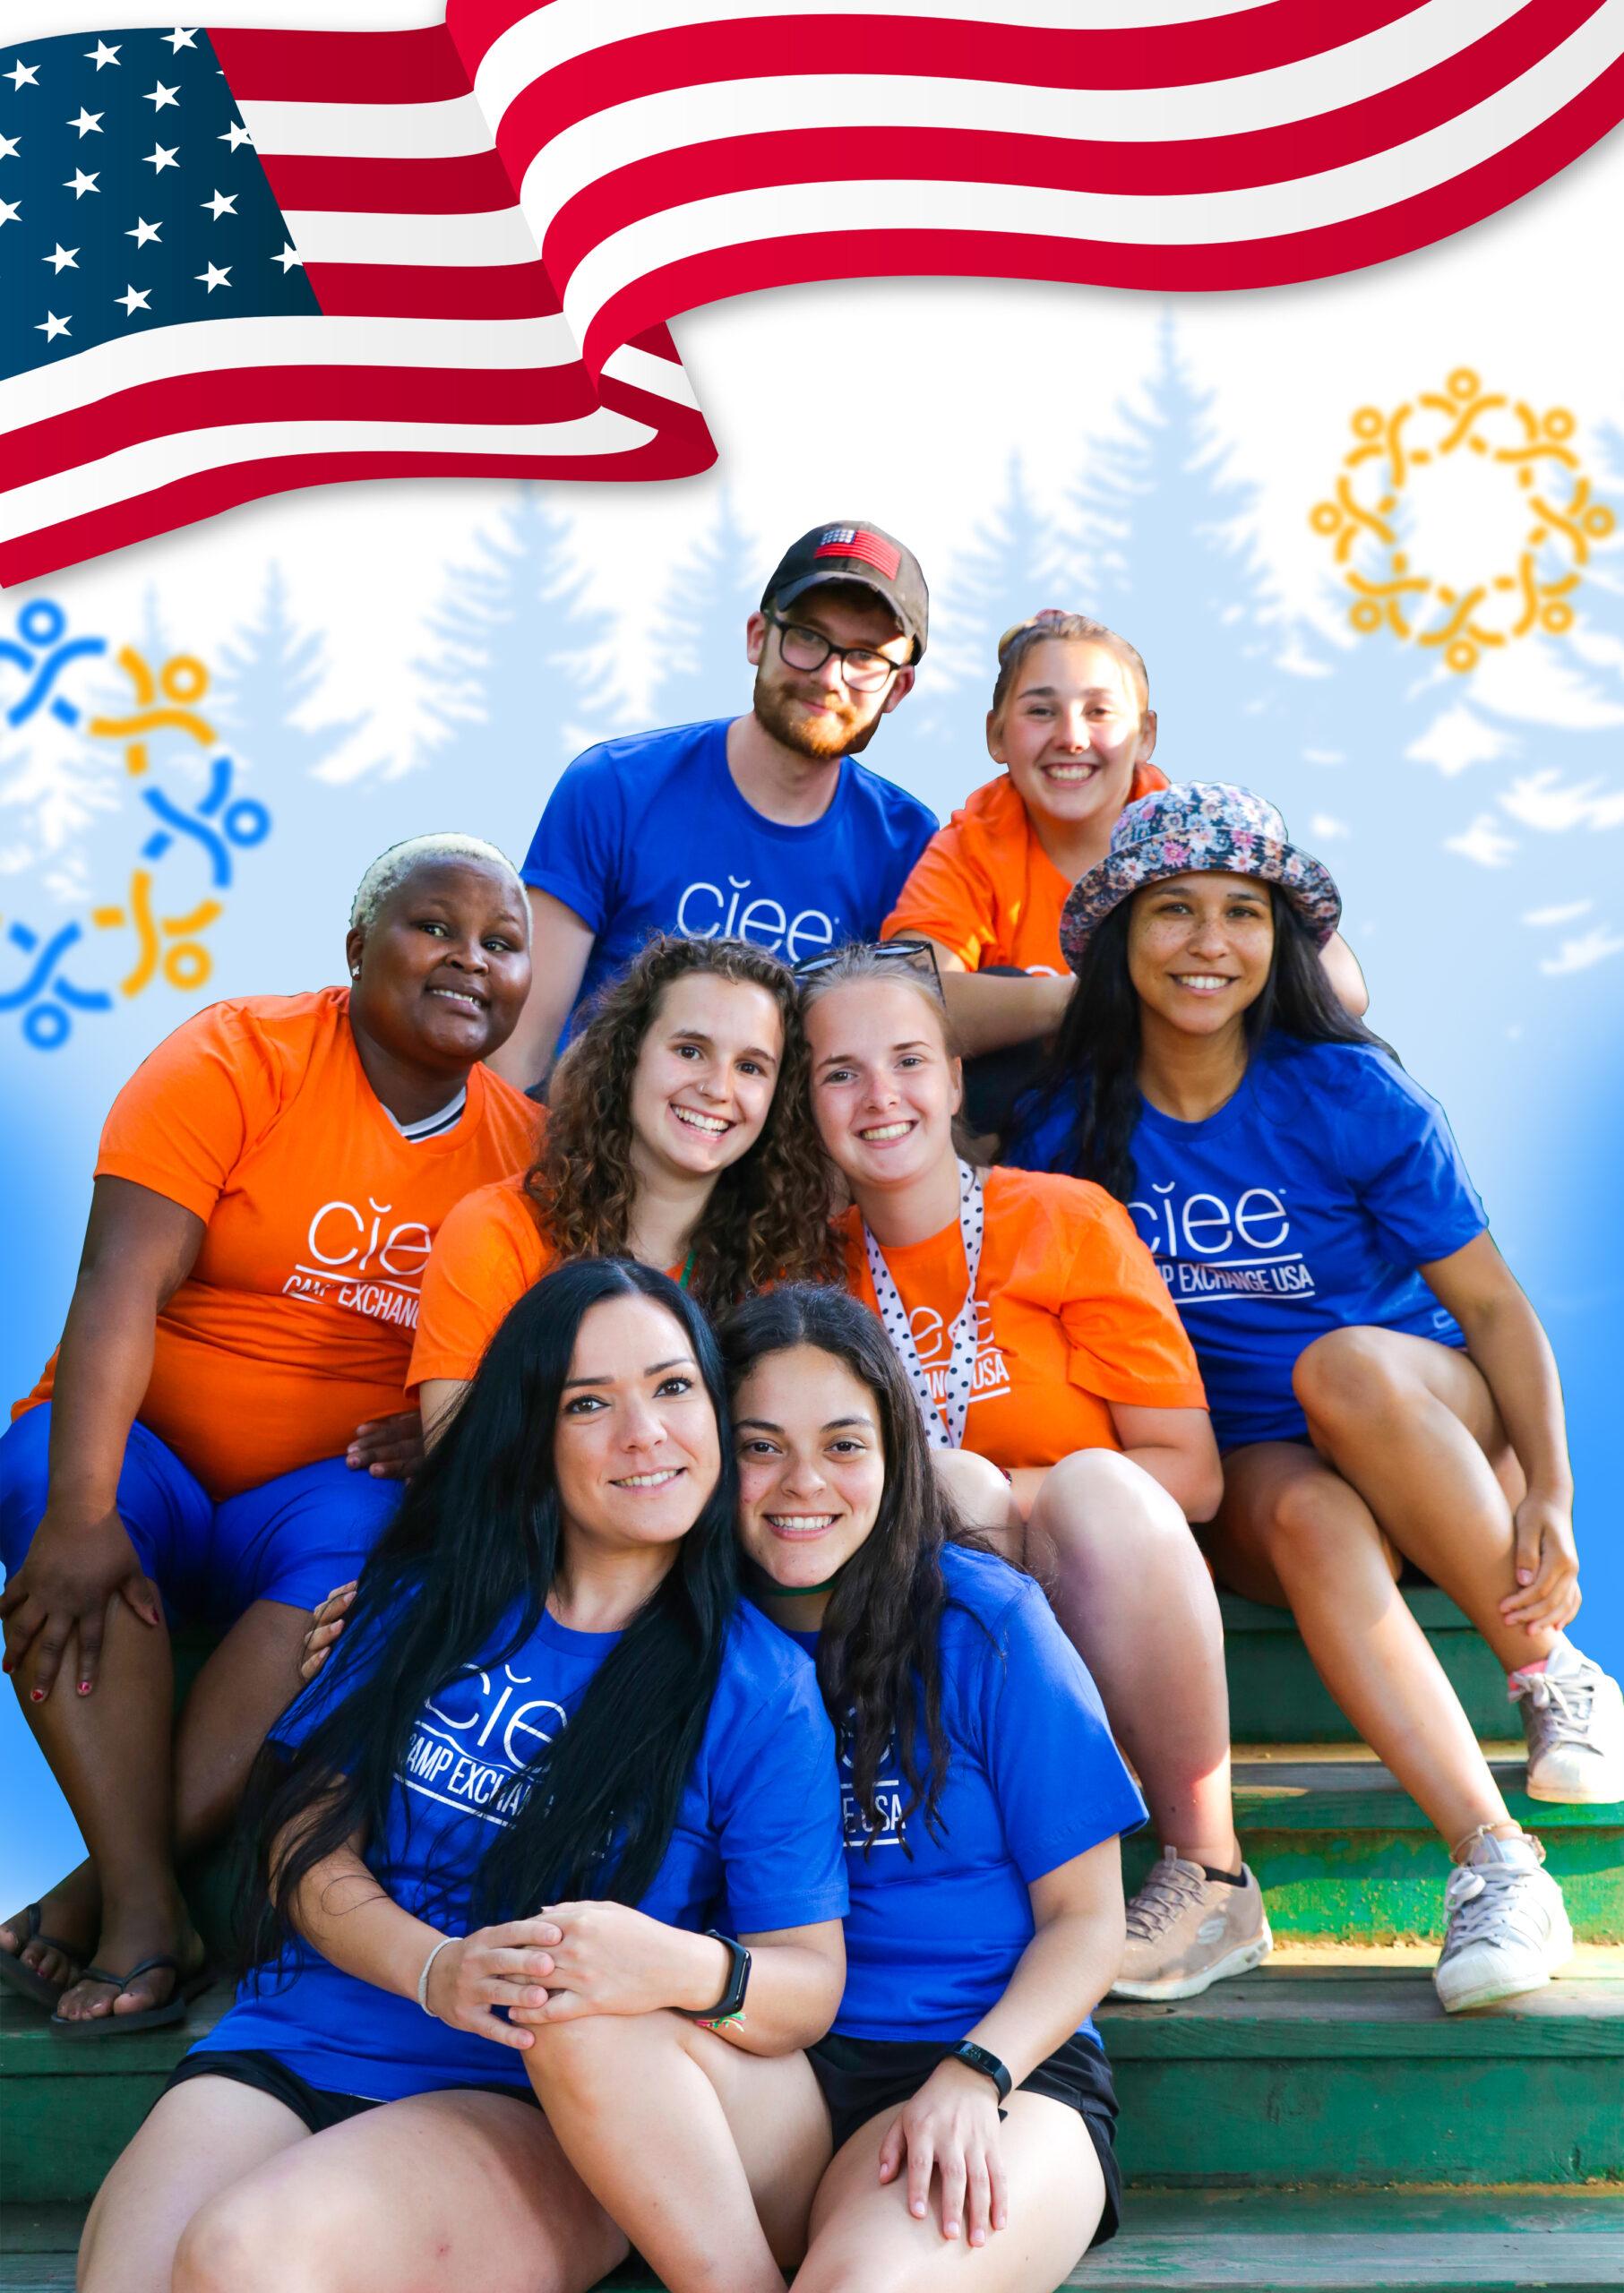 Camp Counselor USA